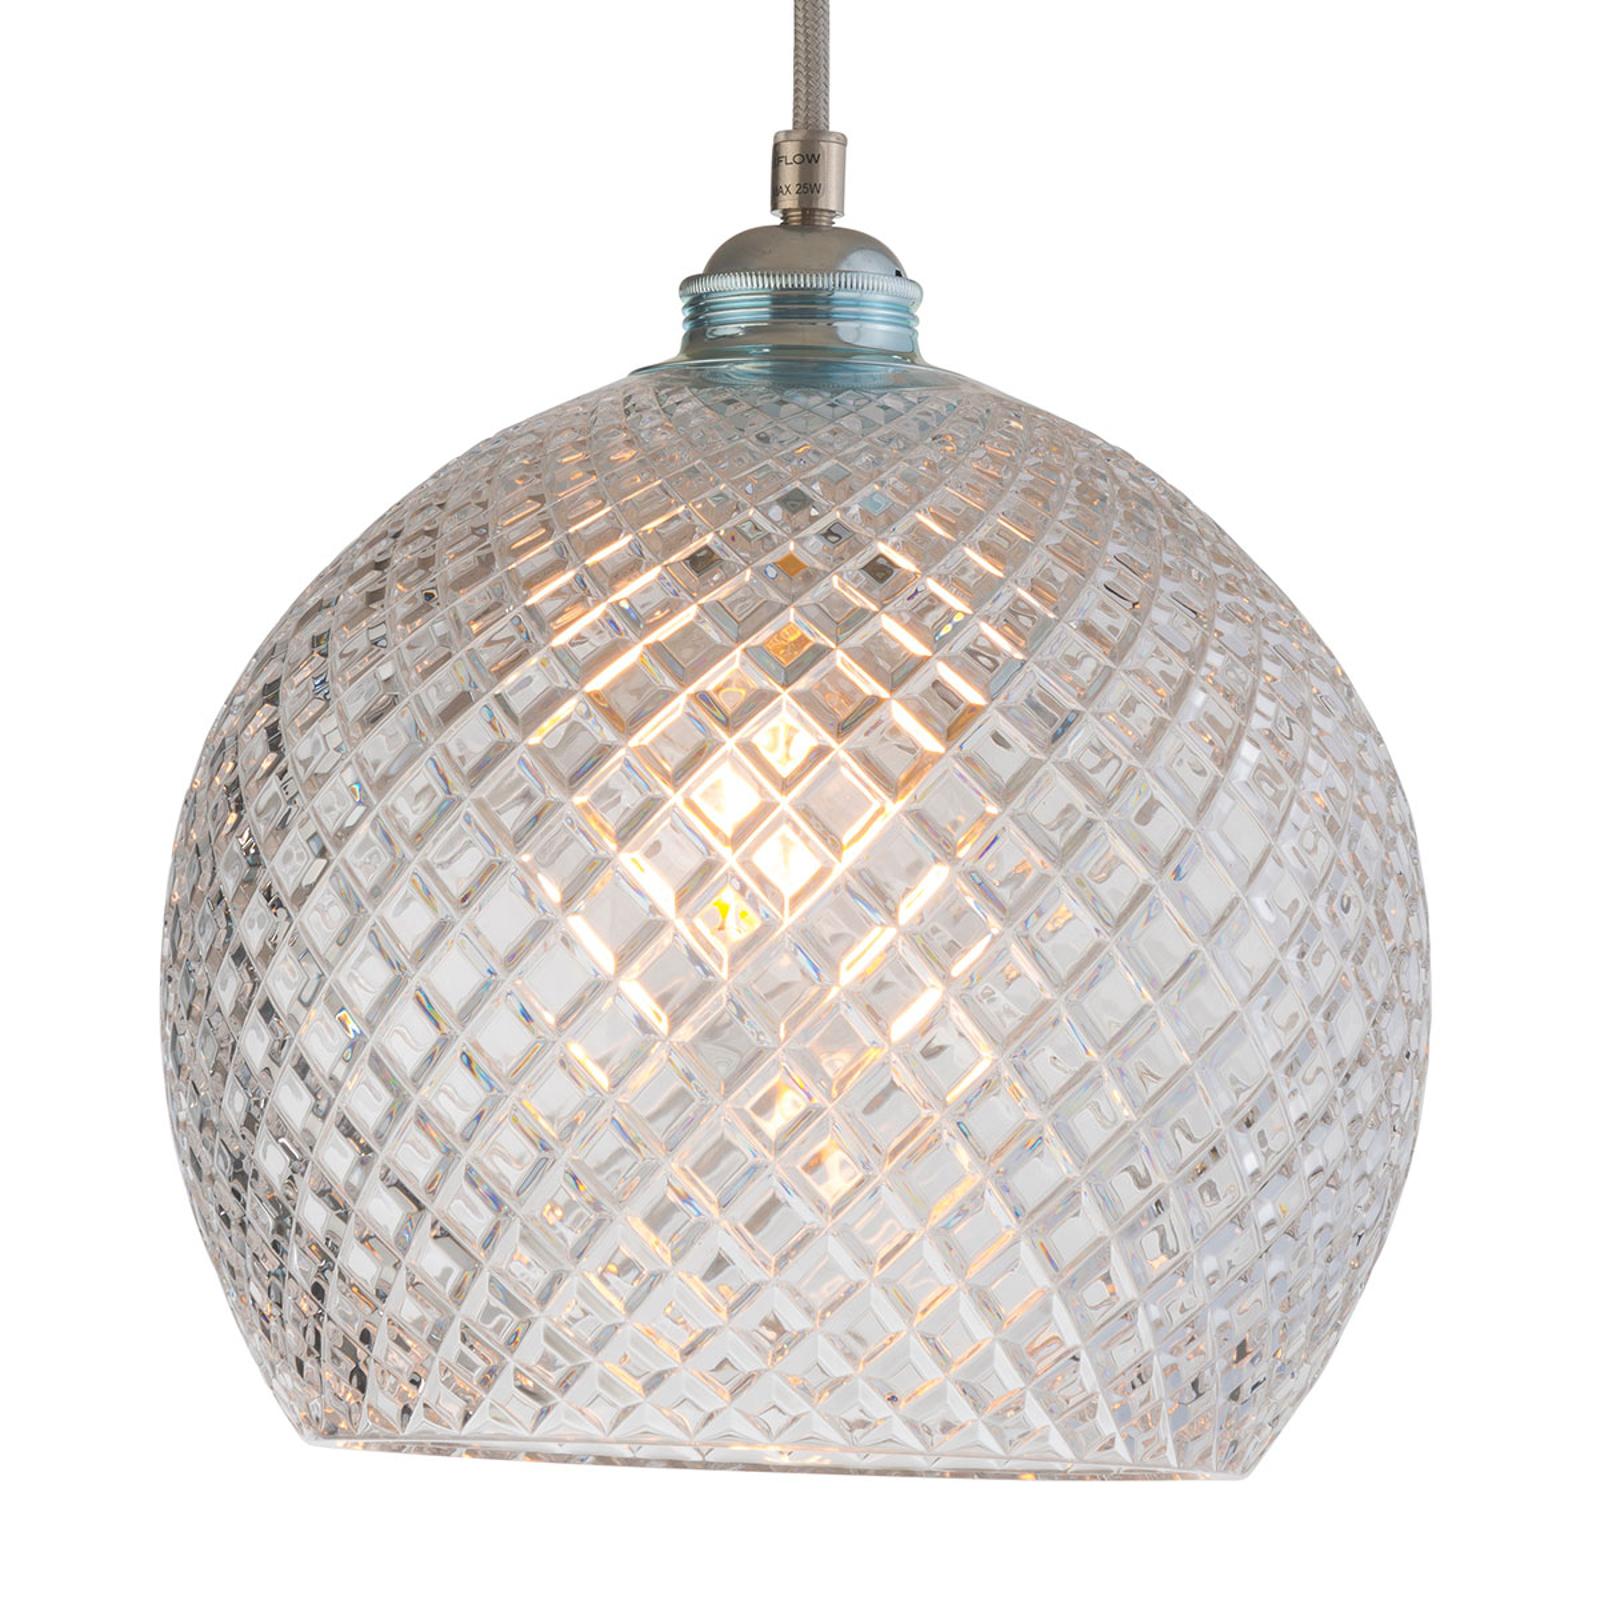 EBB & FLOW Rowan hanglamp, zilver Ø 22cm